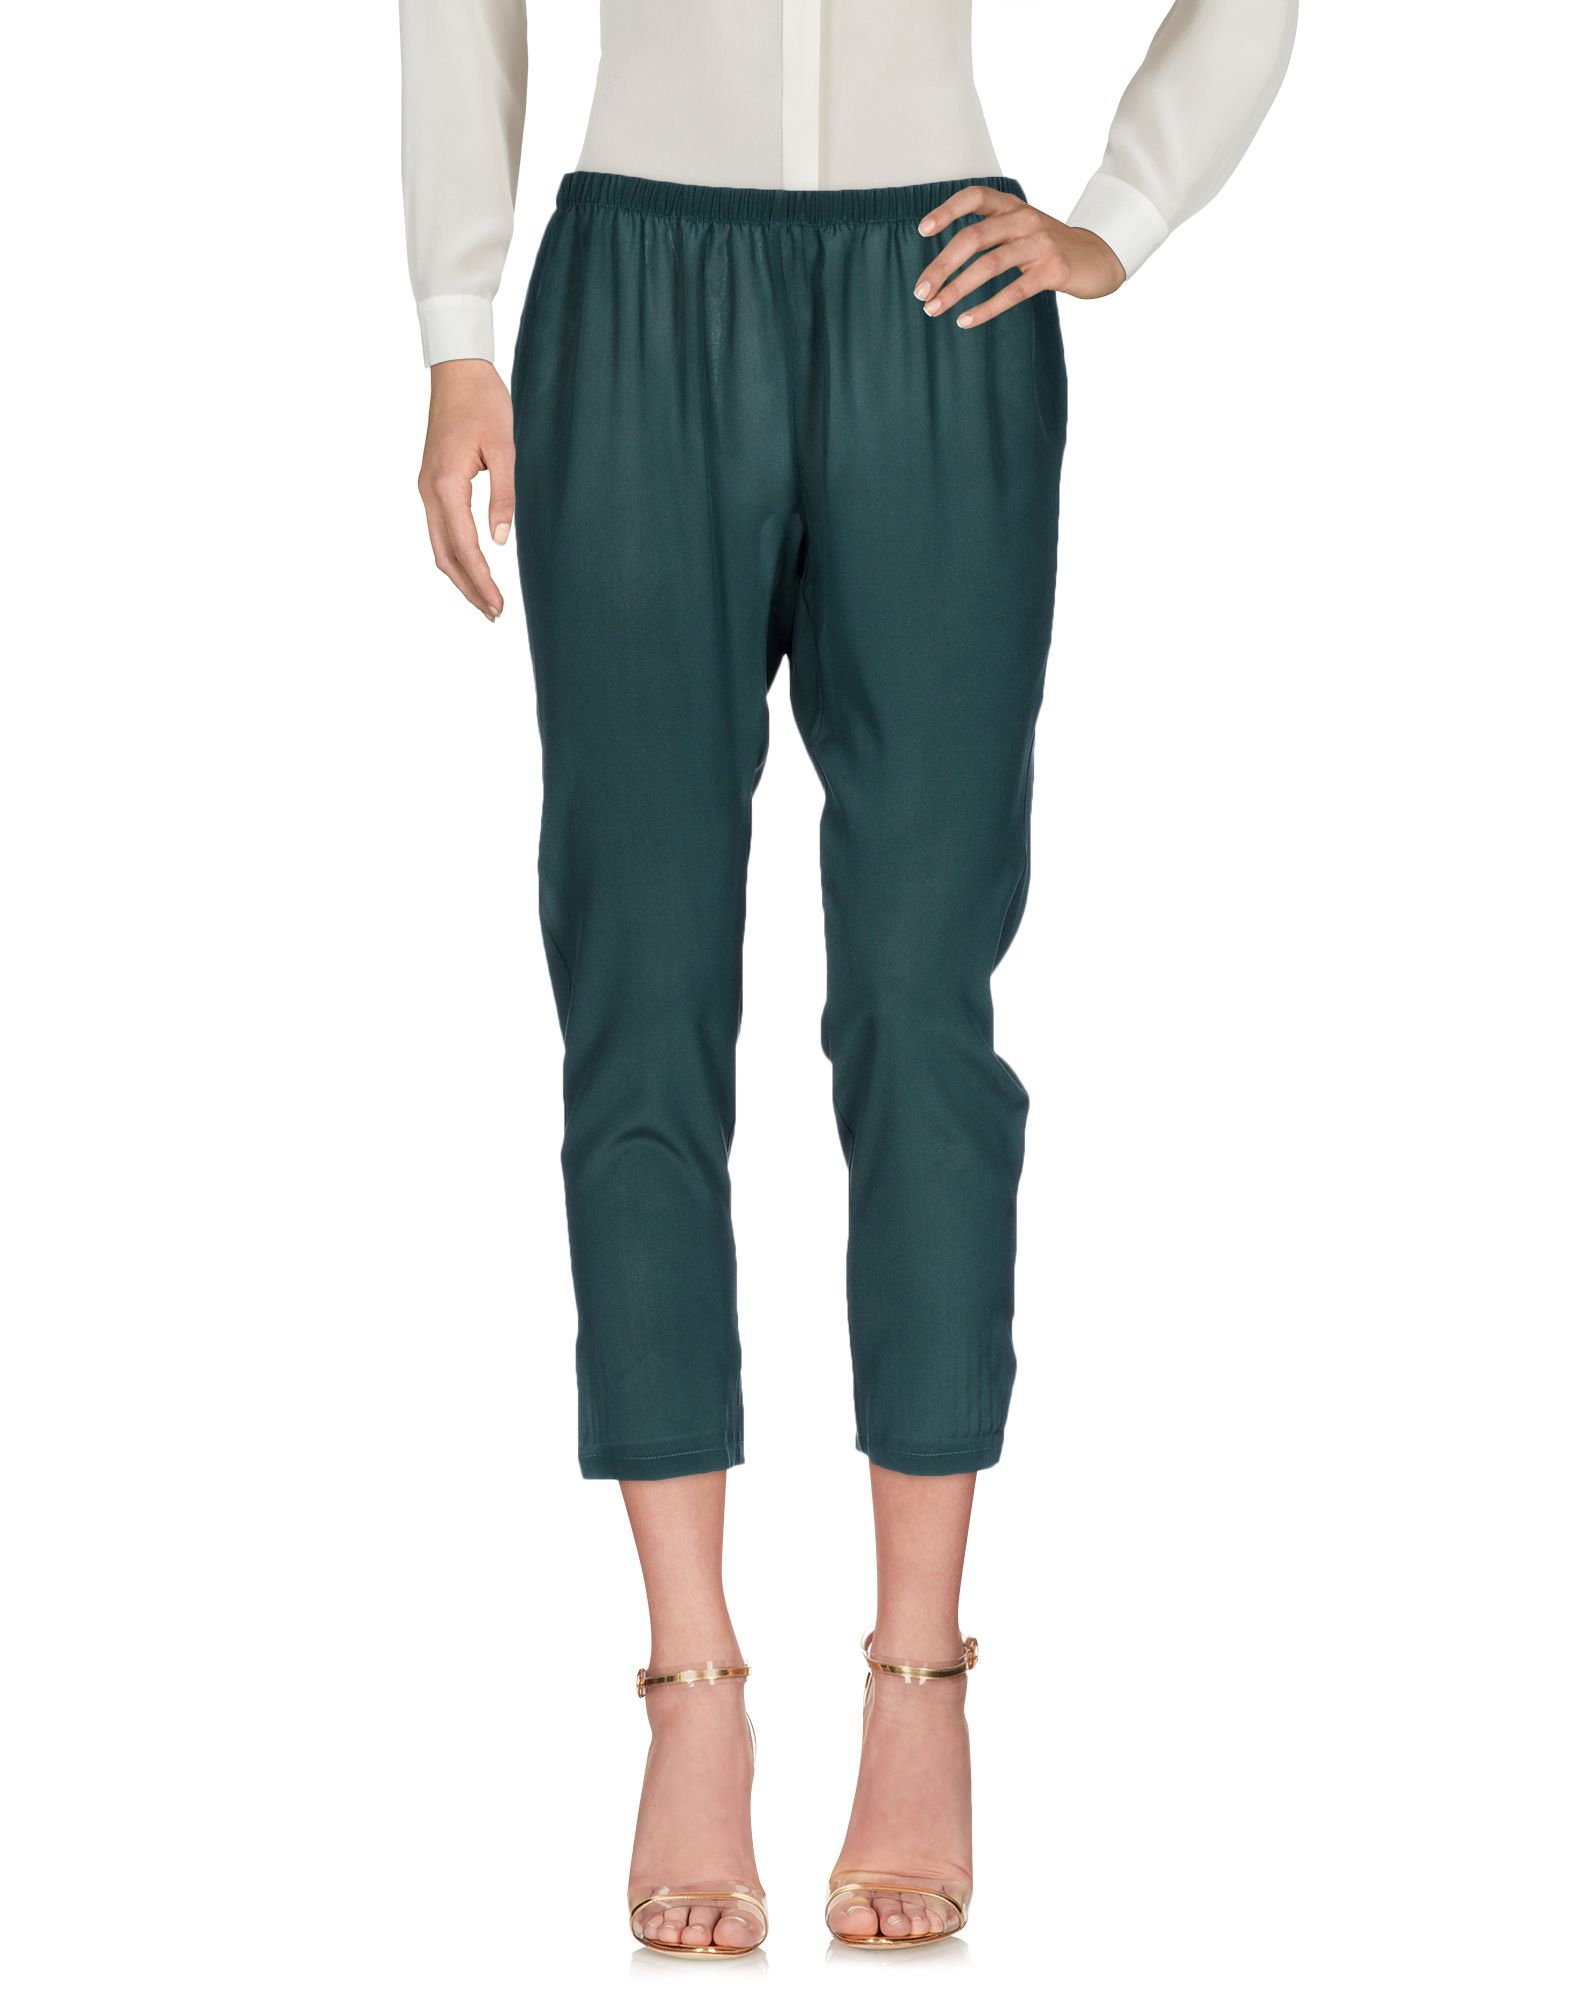 GOTHA Cropped Pants & Culottes in Dark Green